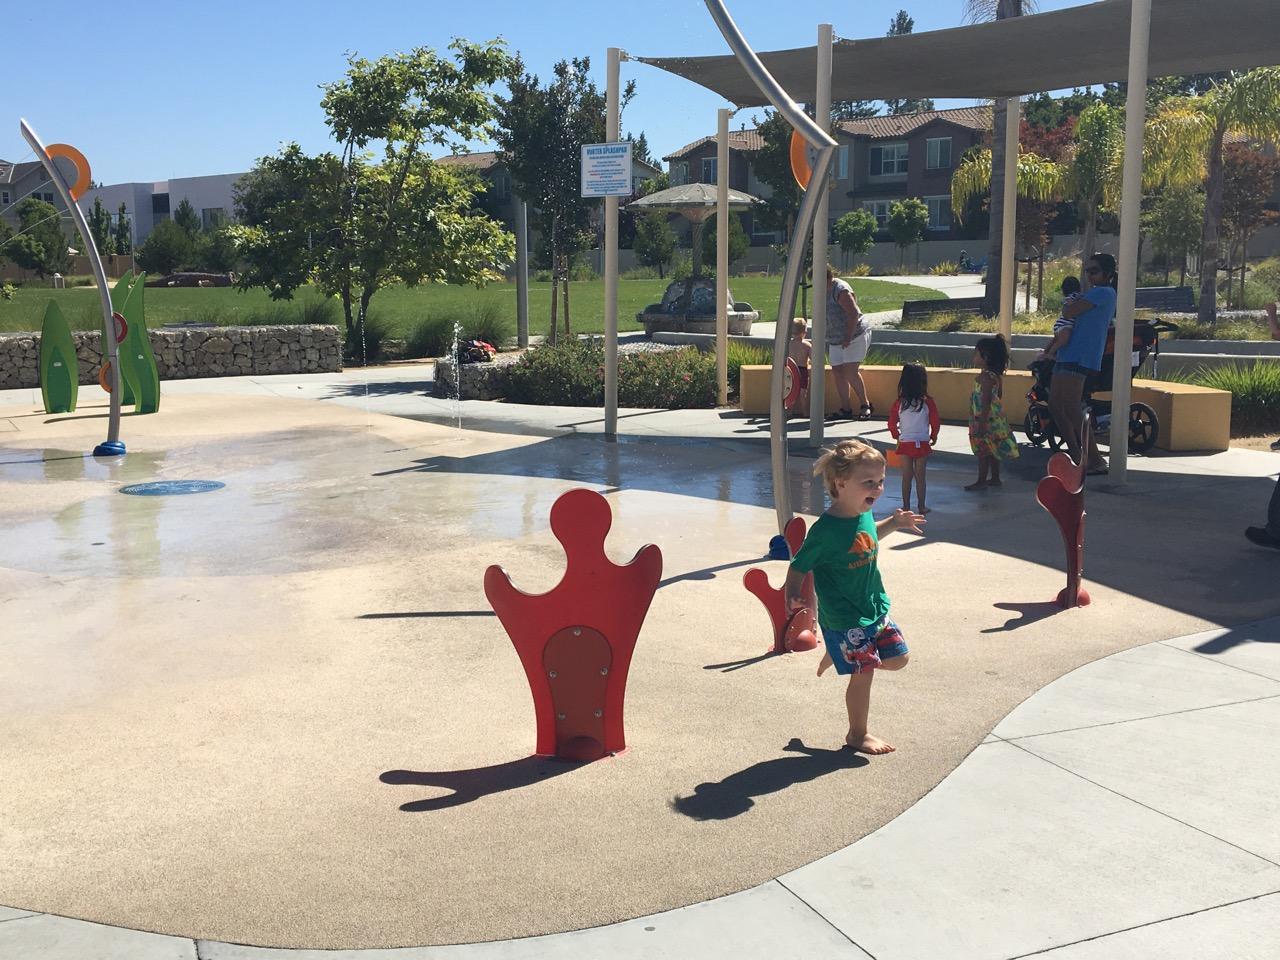 Splash pad fun (July)